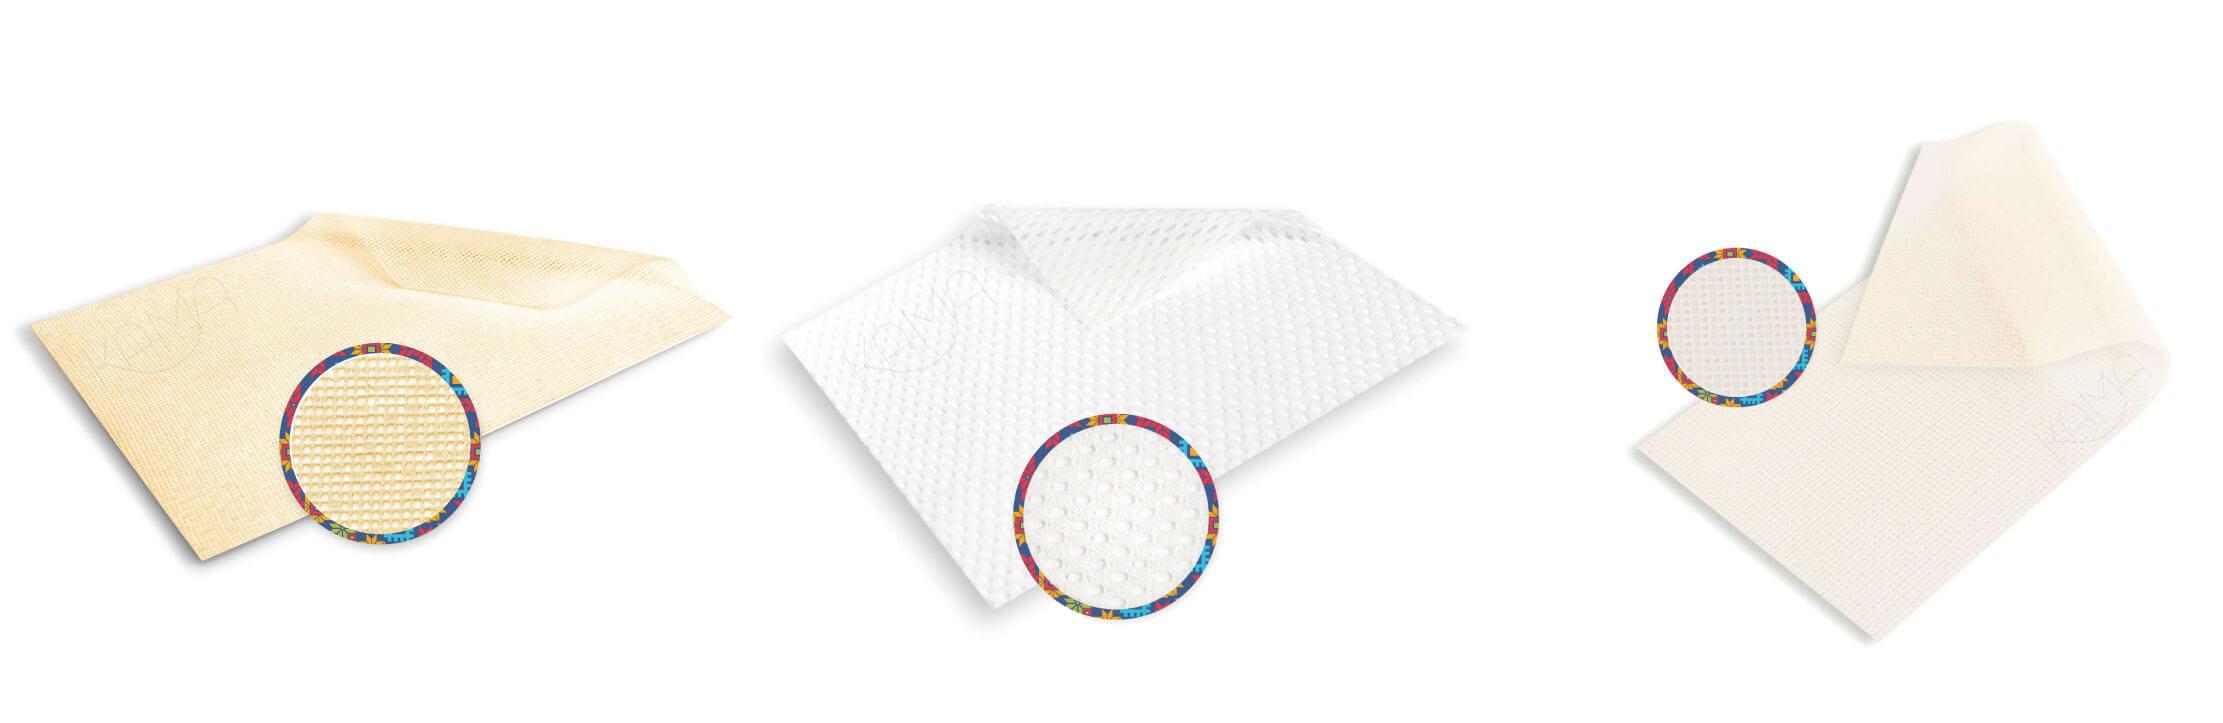 сетчатые повязки для лечения ран бренда Optimelle